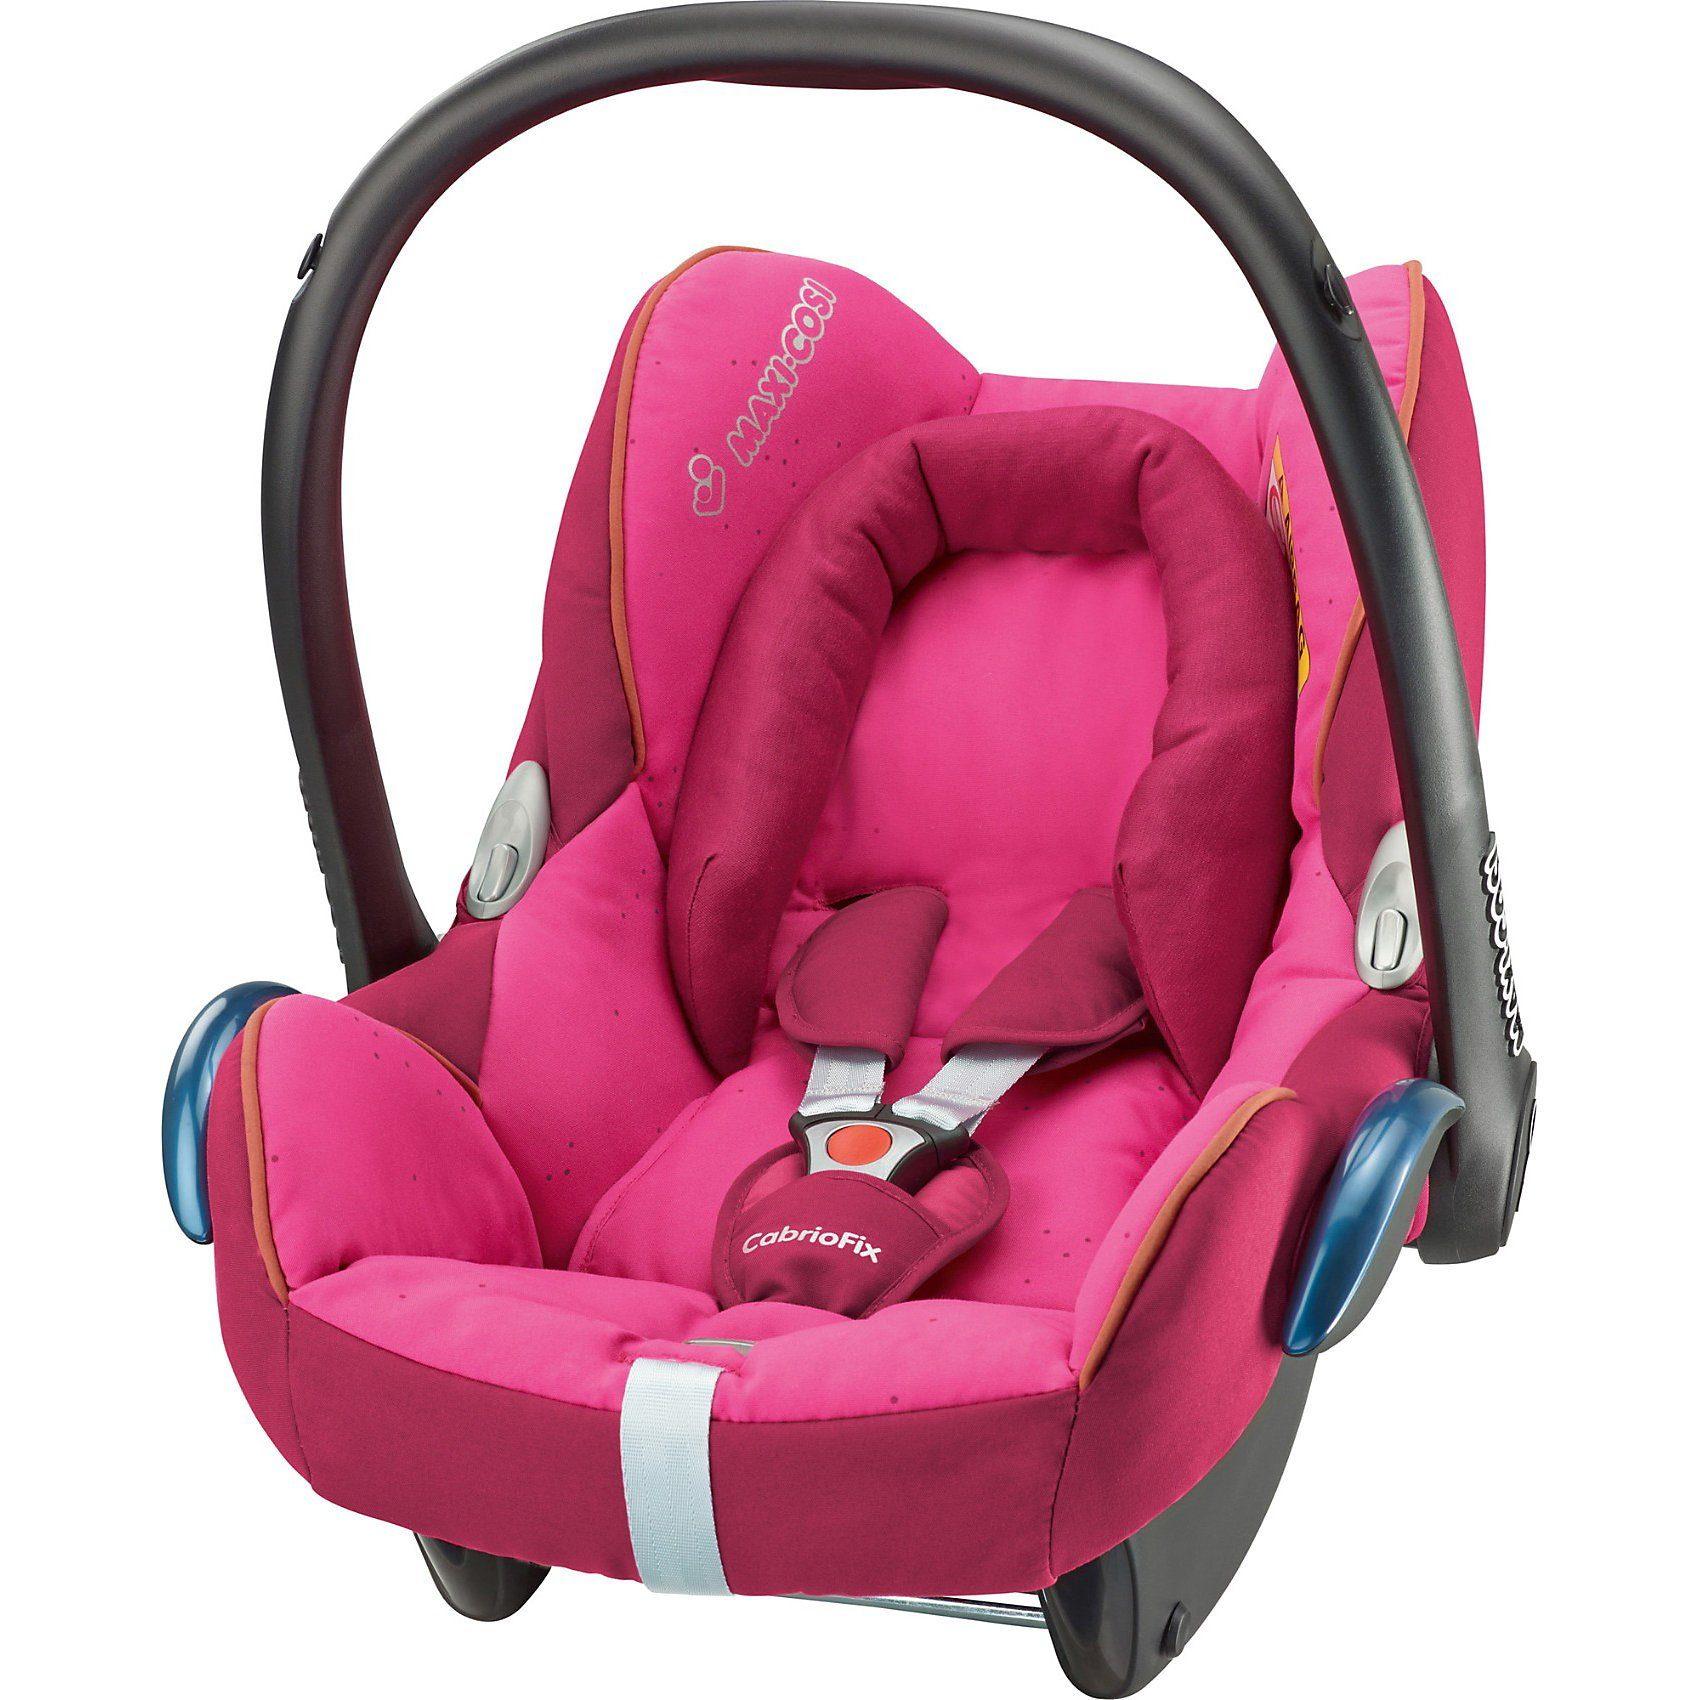 Maxi-Cosi Babyschale Cabriofix, Berry Pink, 2015